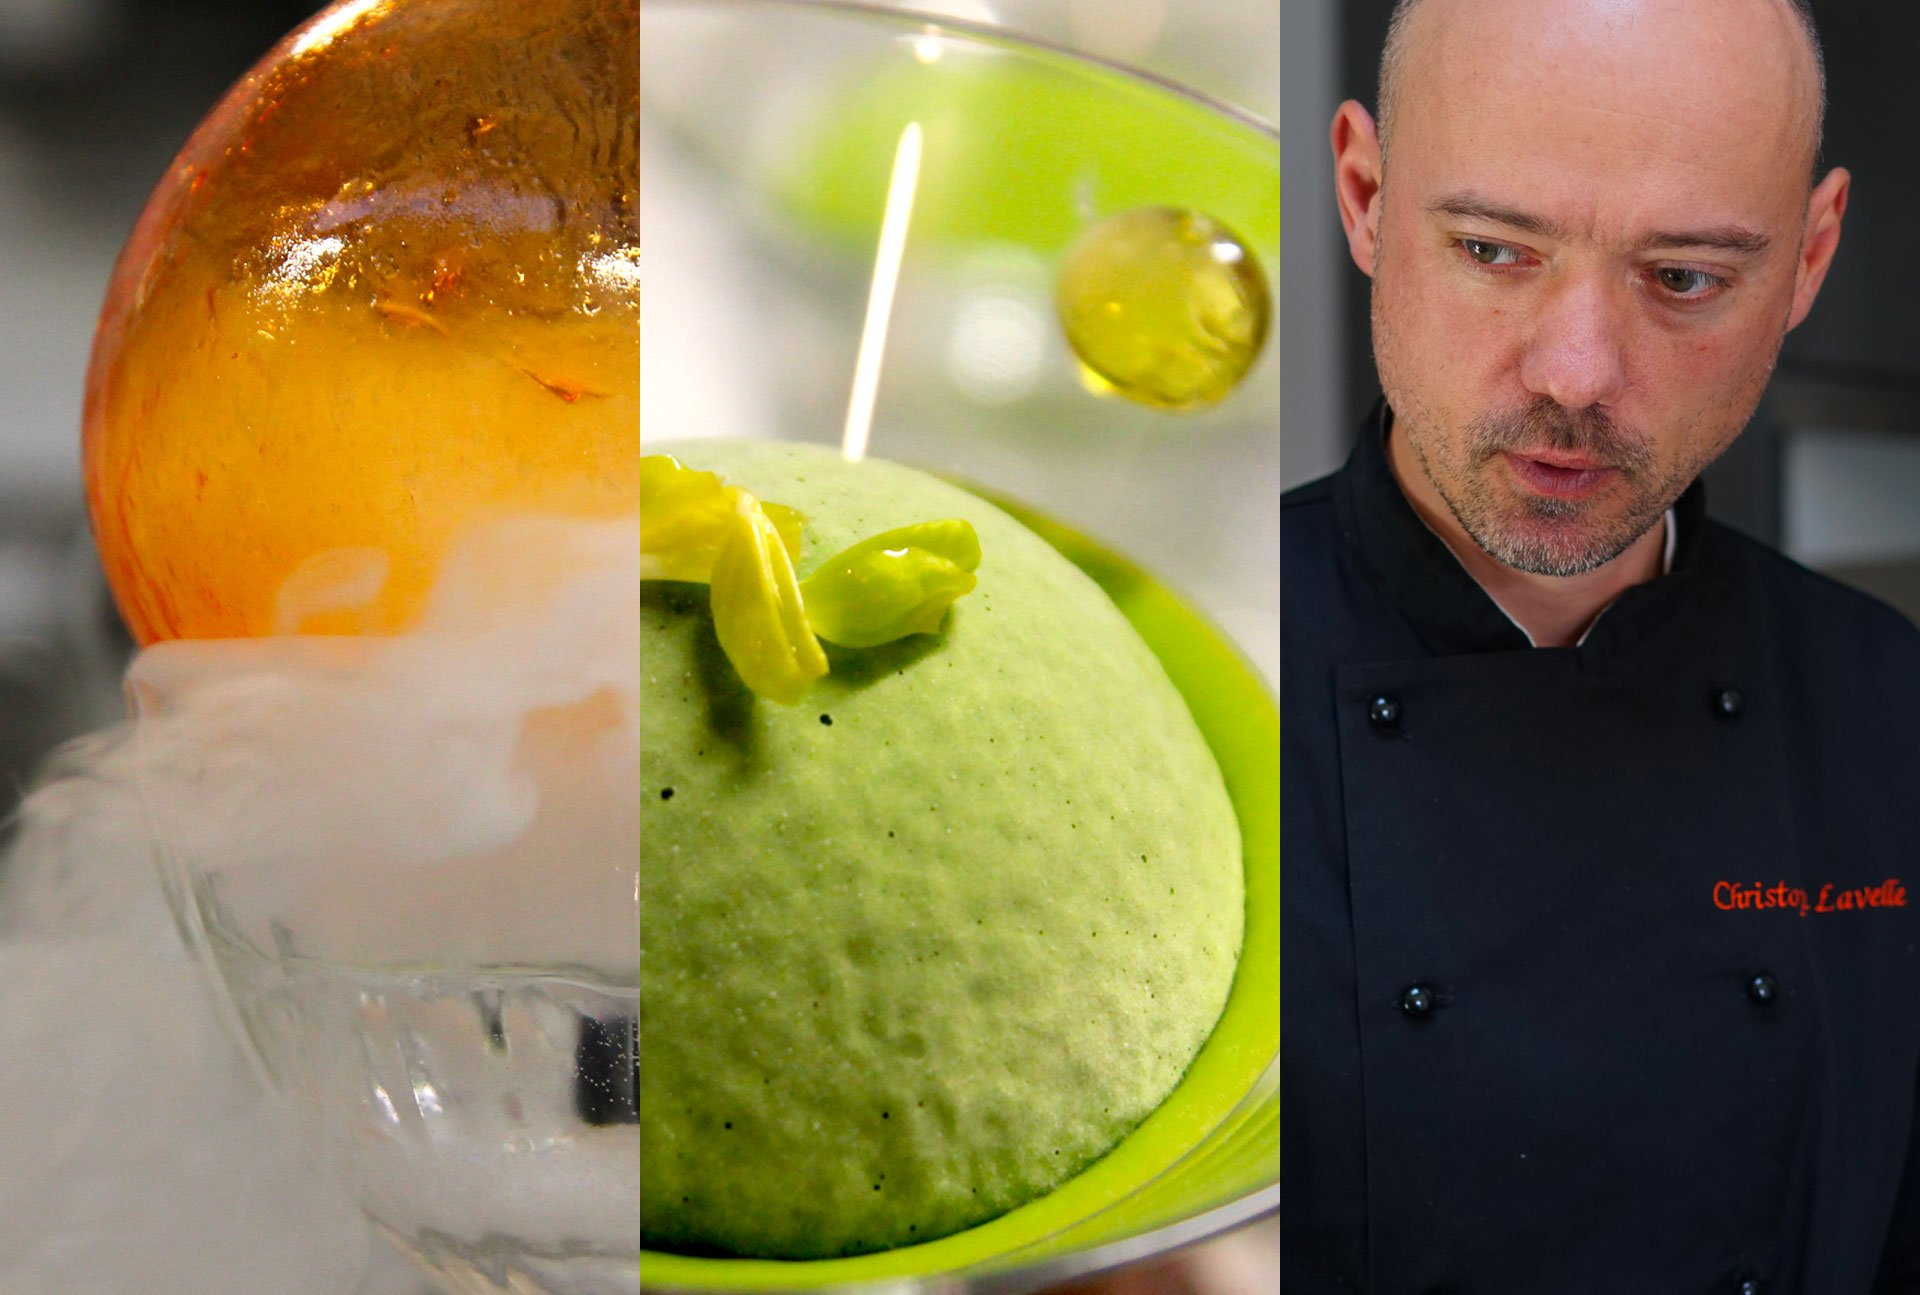 Christophe Lavelle molecular cuisine